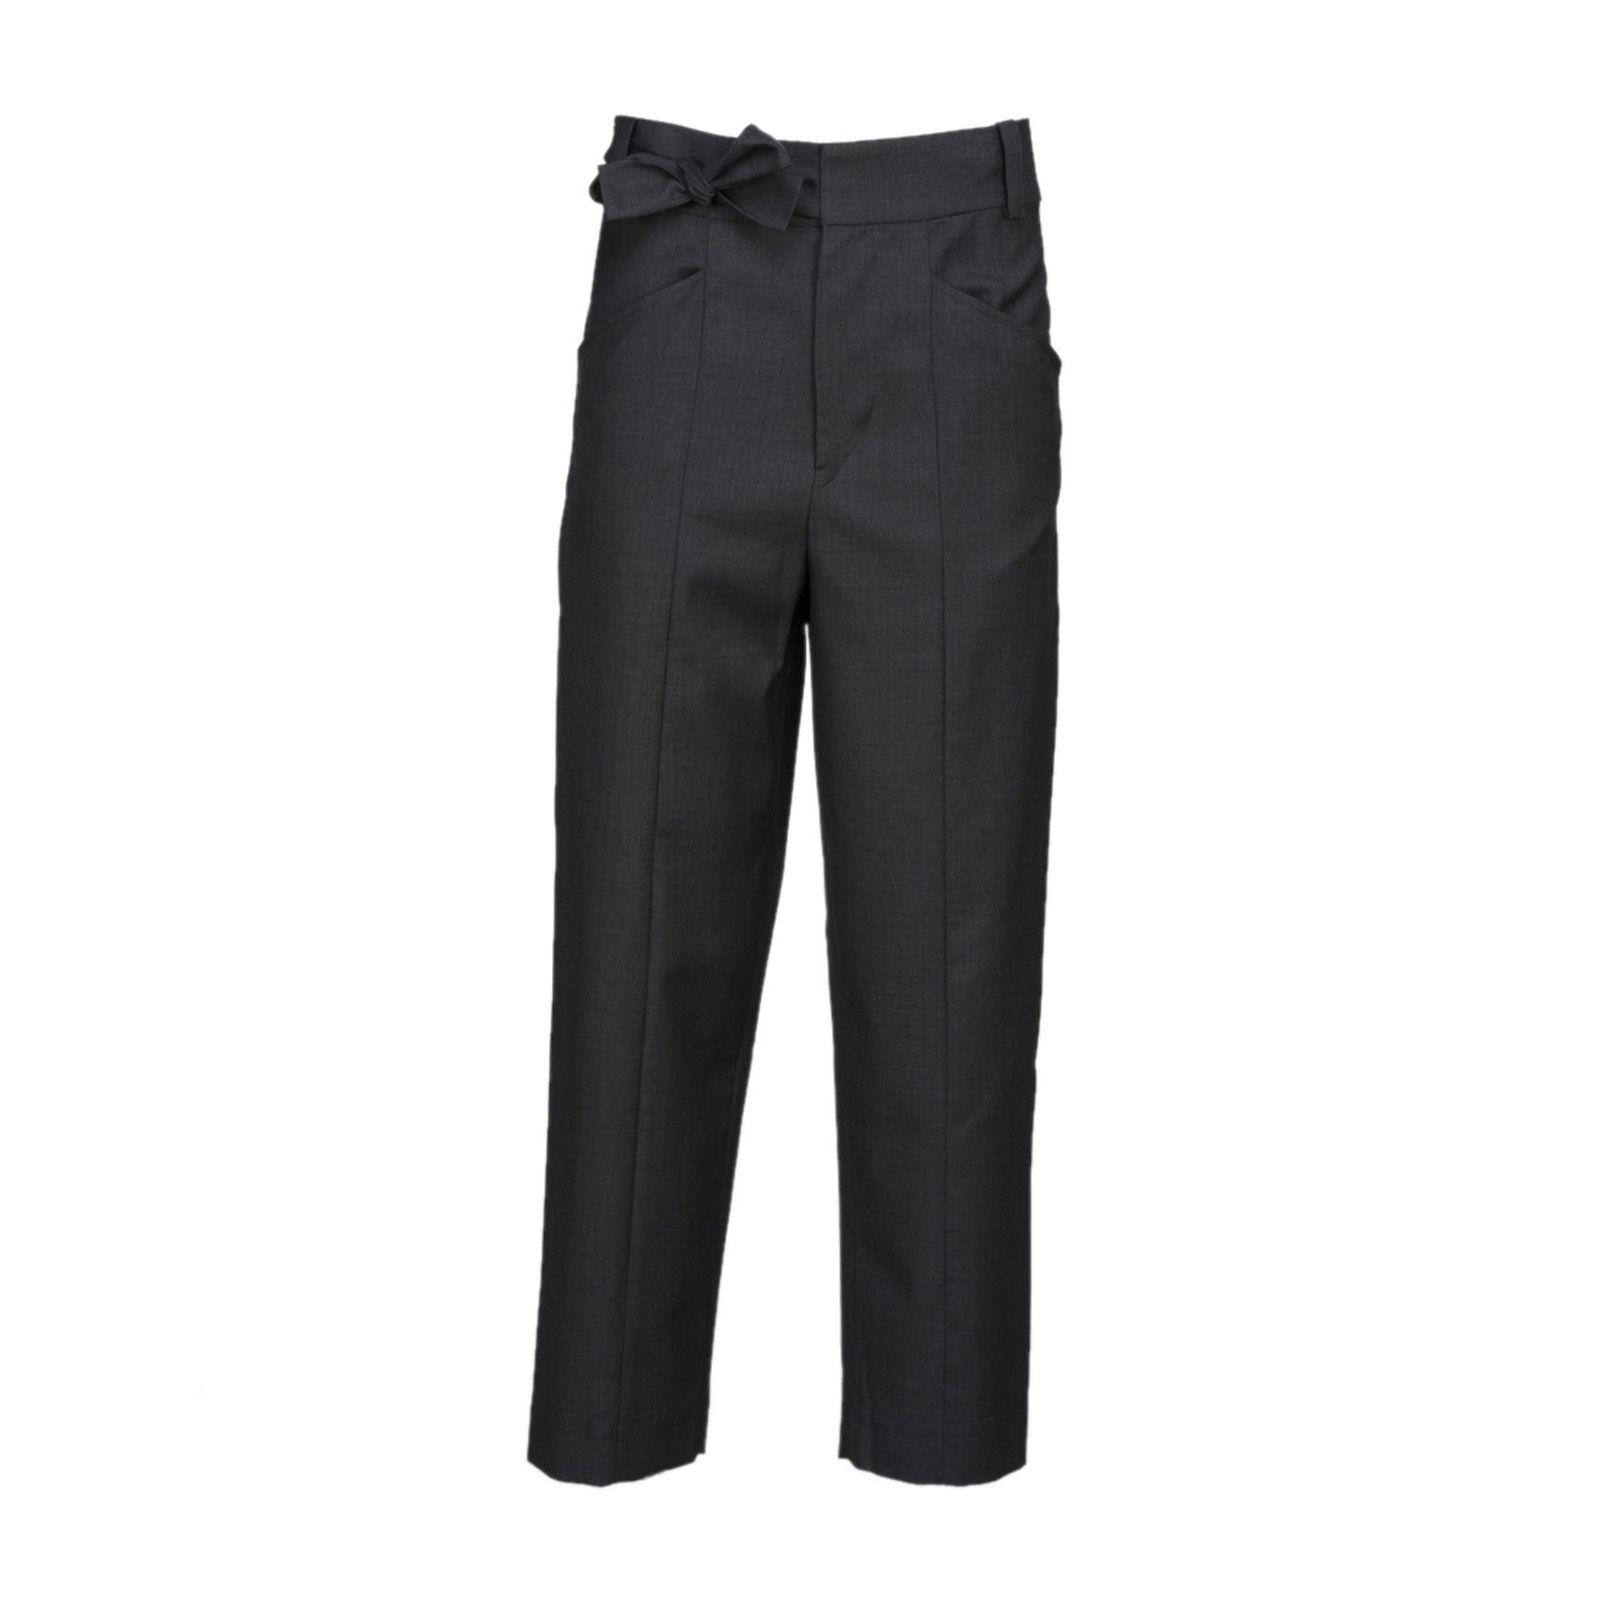 Nagano trousers - Grey Isabel Marant